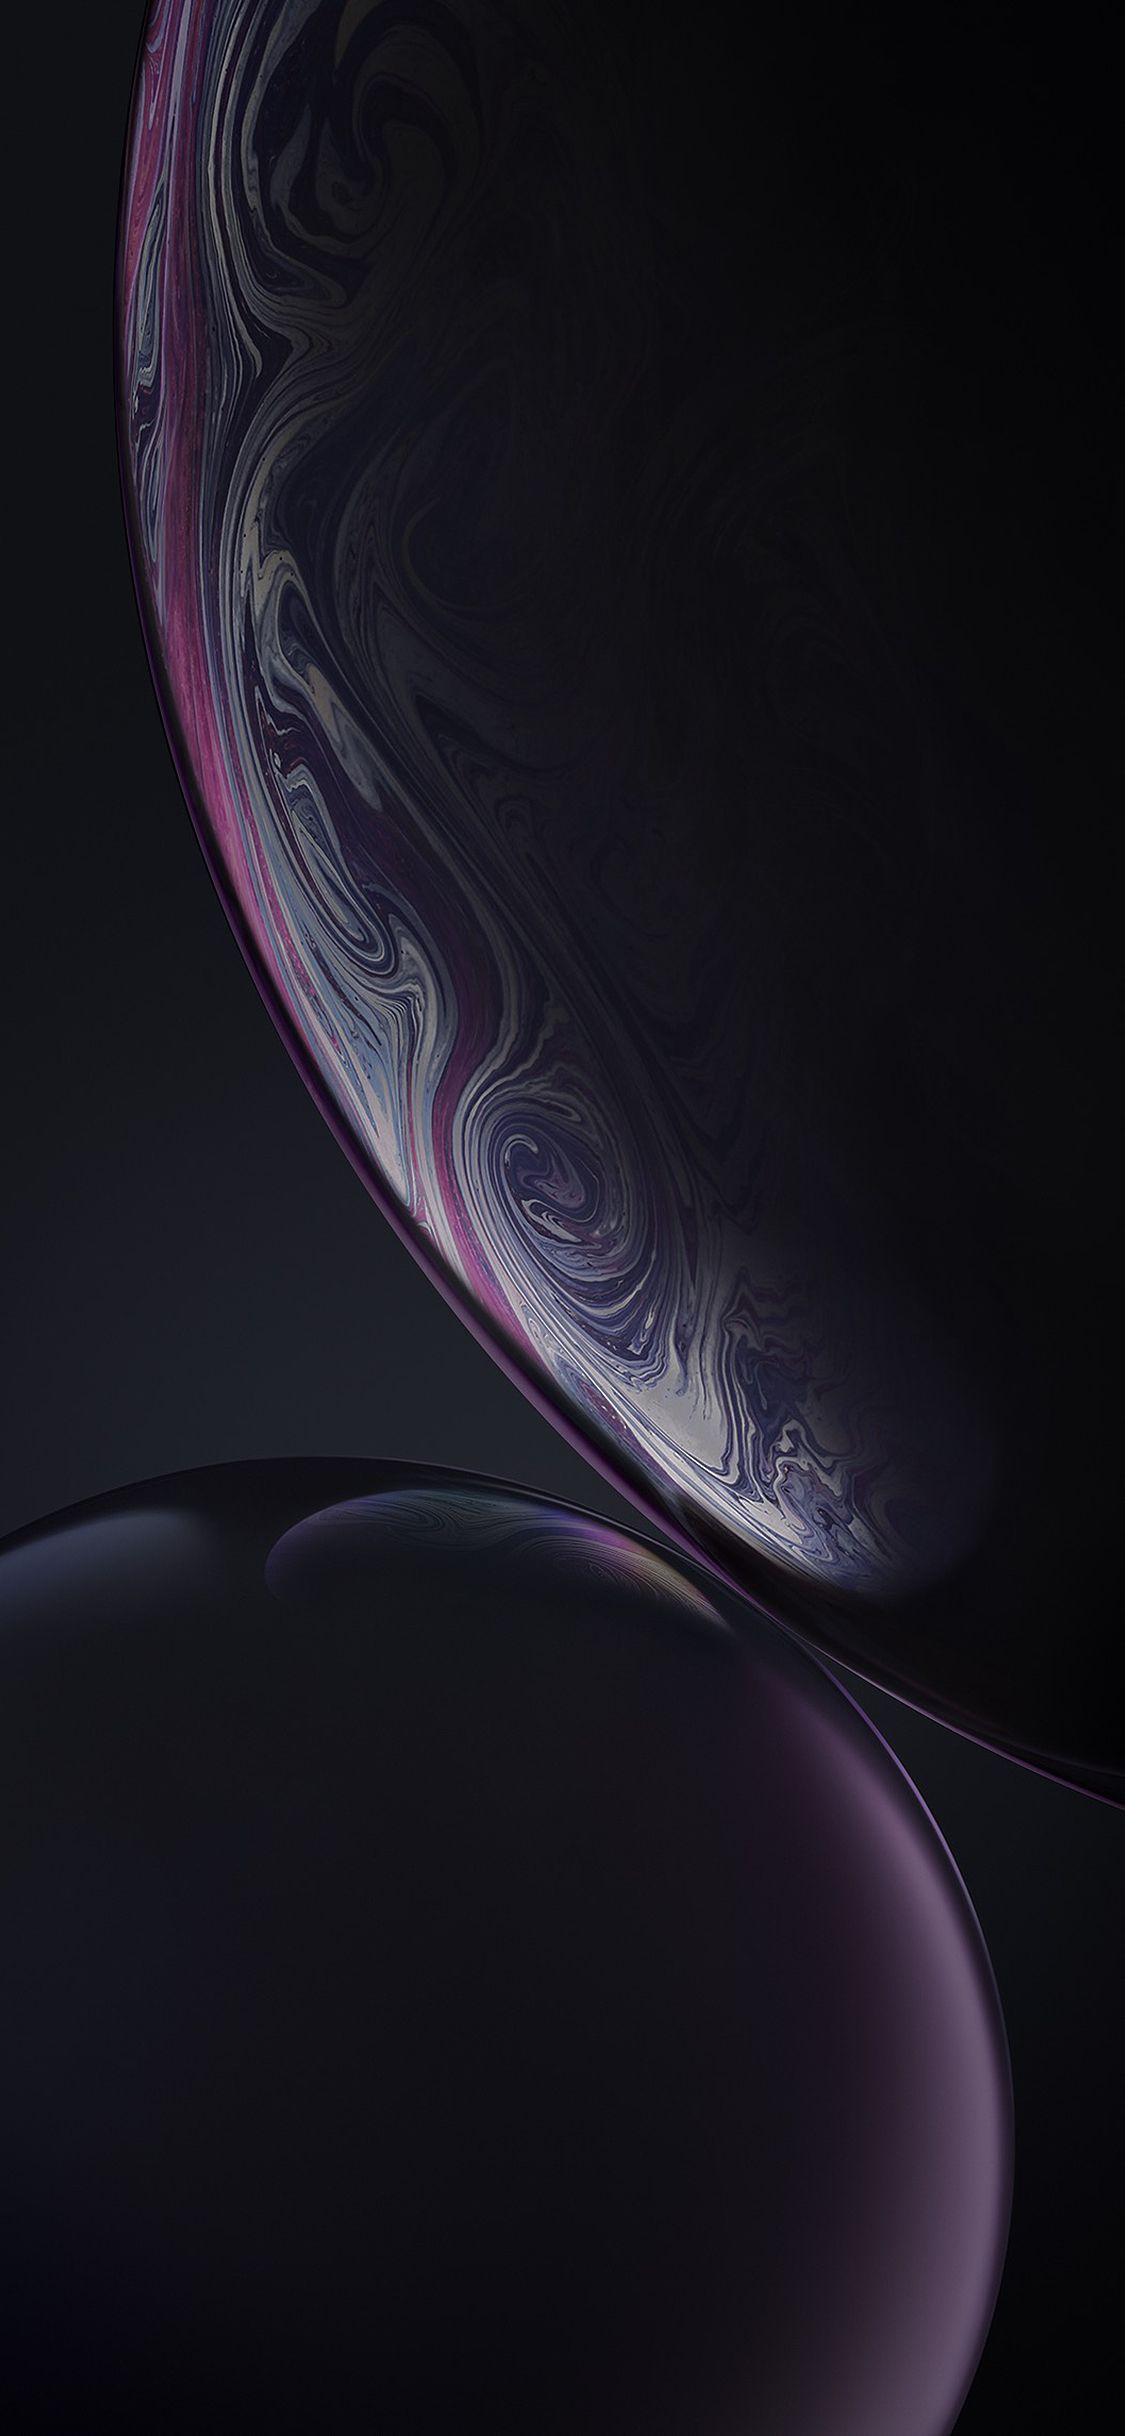 iPhone XR ,XS ,XS Max Wallpaper iPhone Wallpaper in 2019